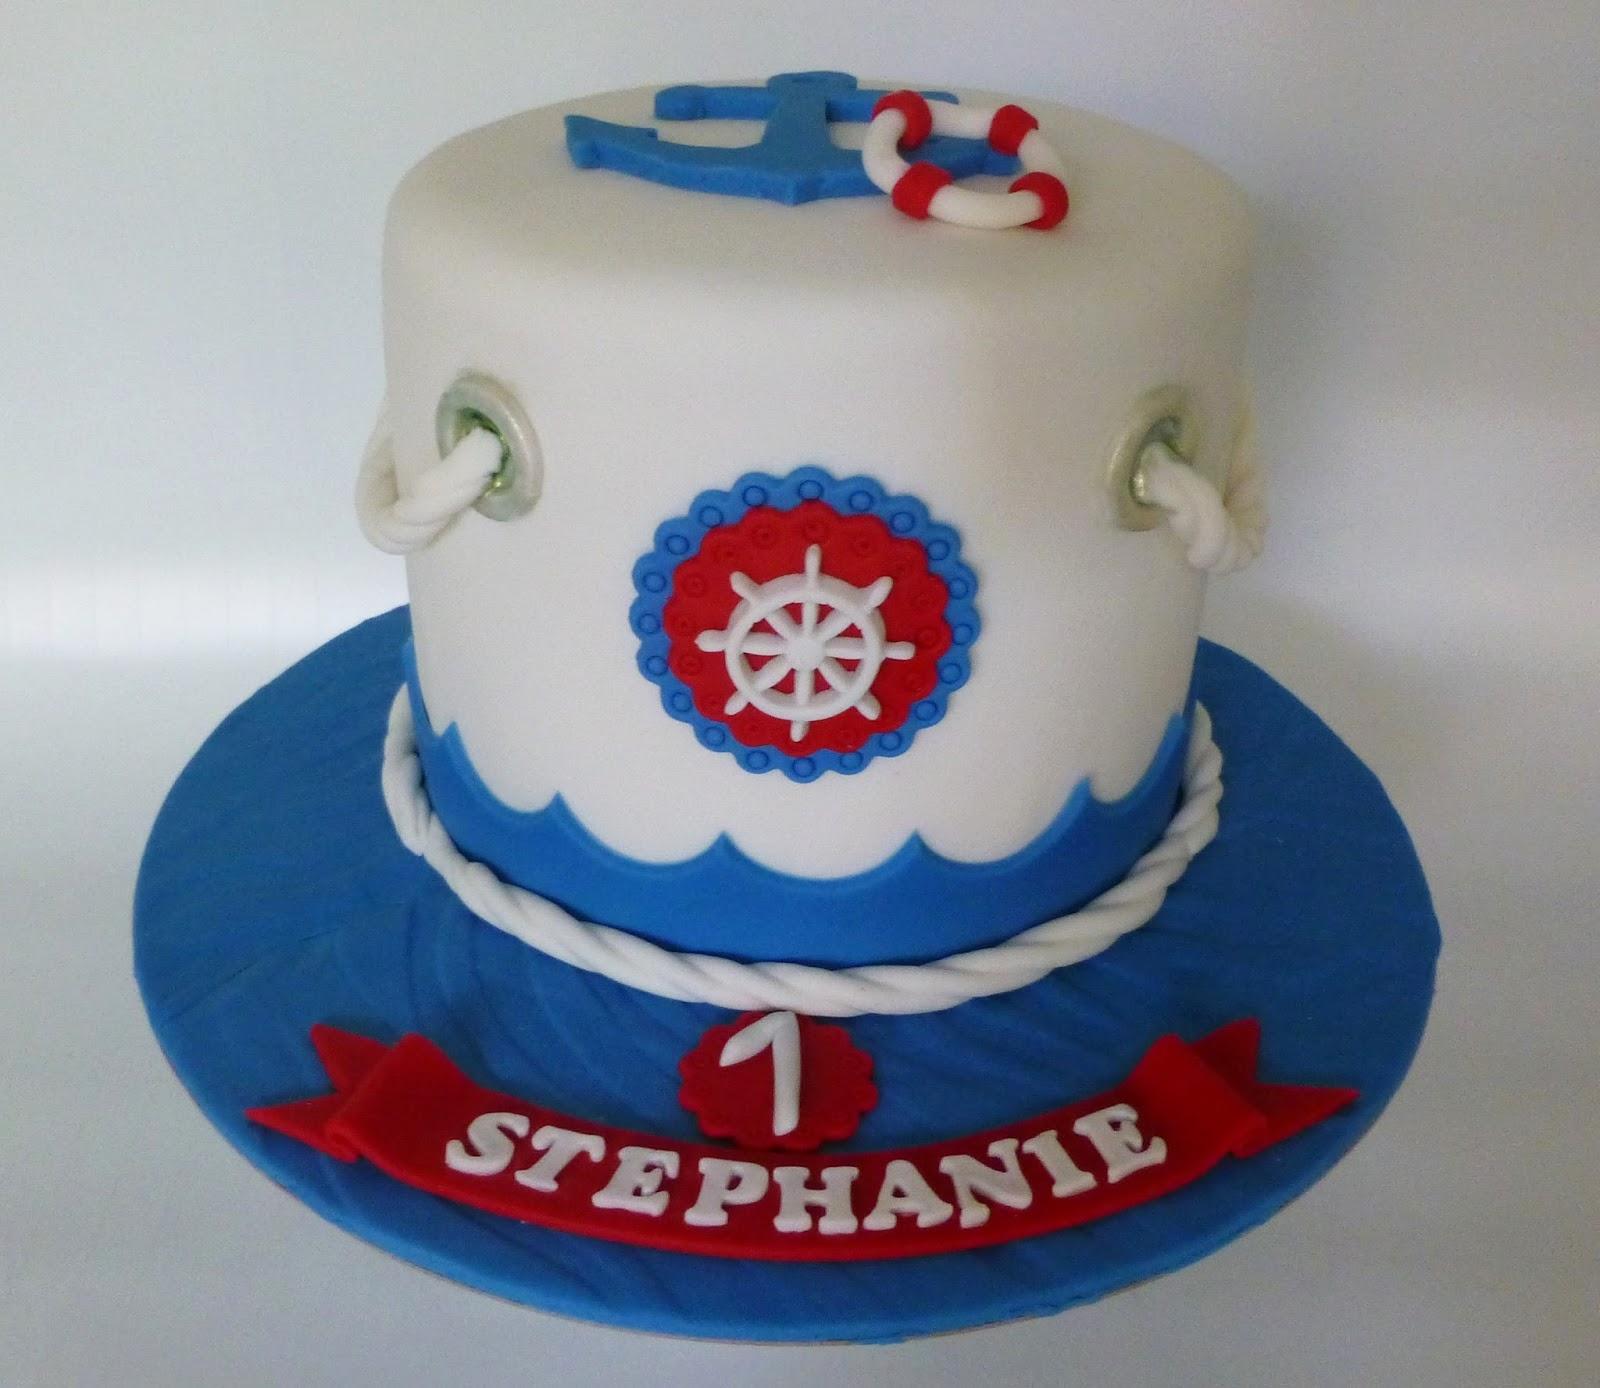 Cakesophia Stephanies 1 Birthday Second Part